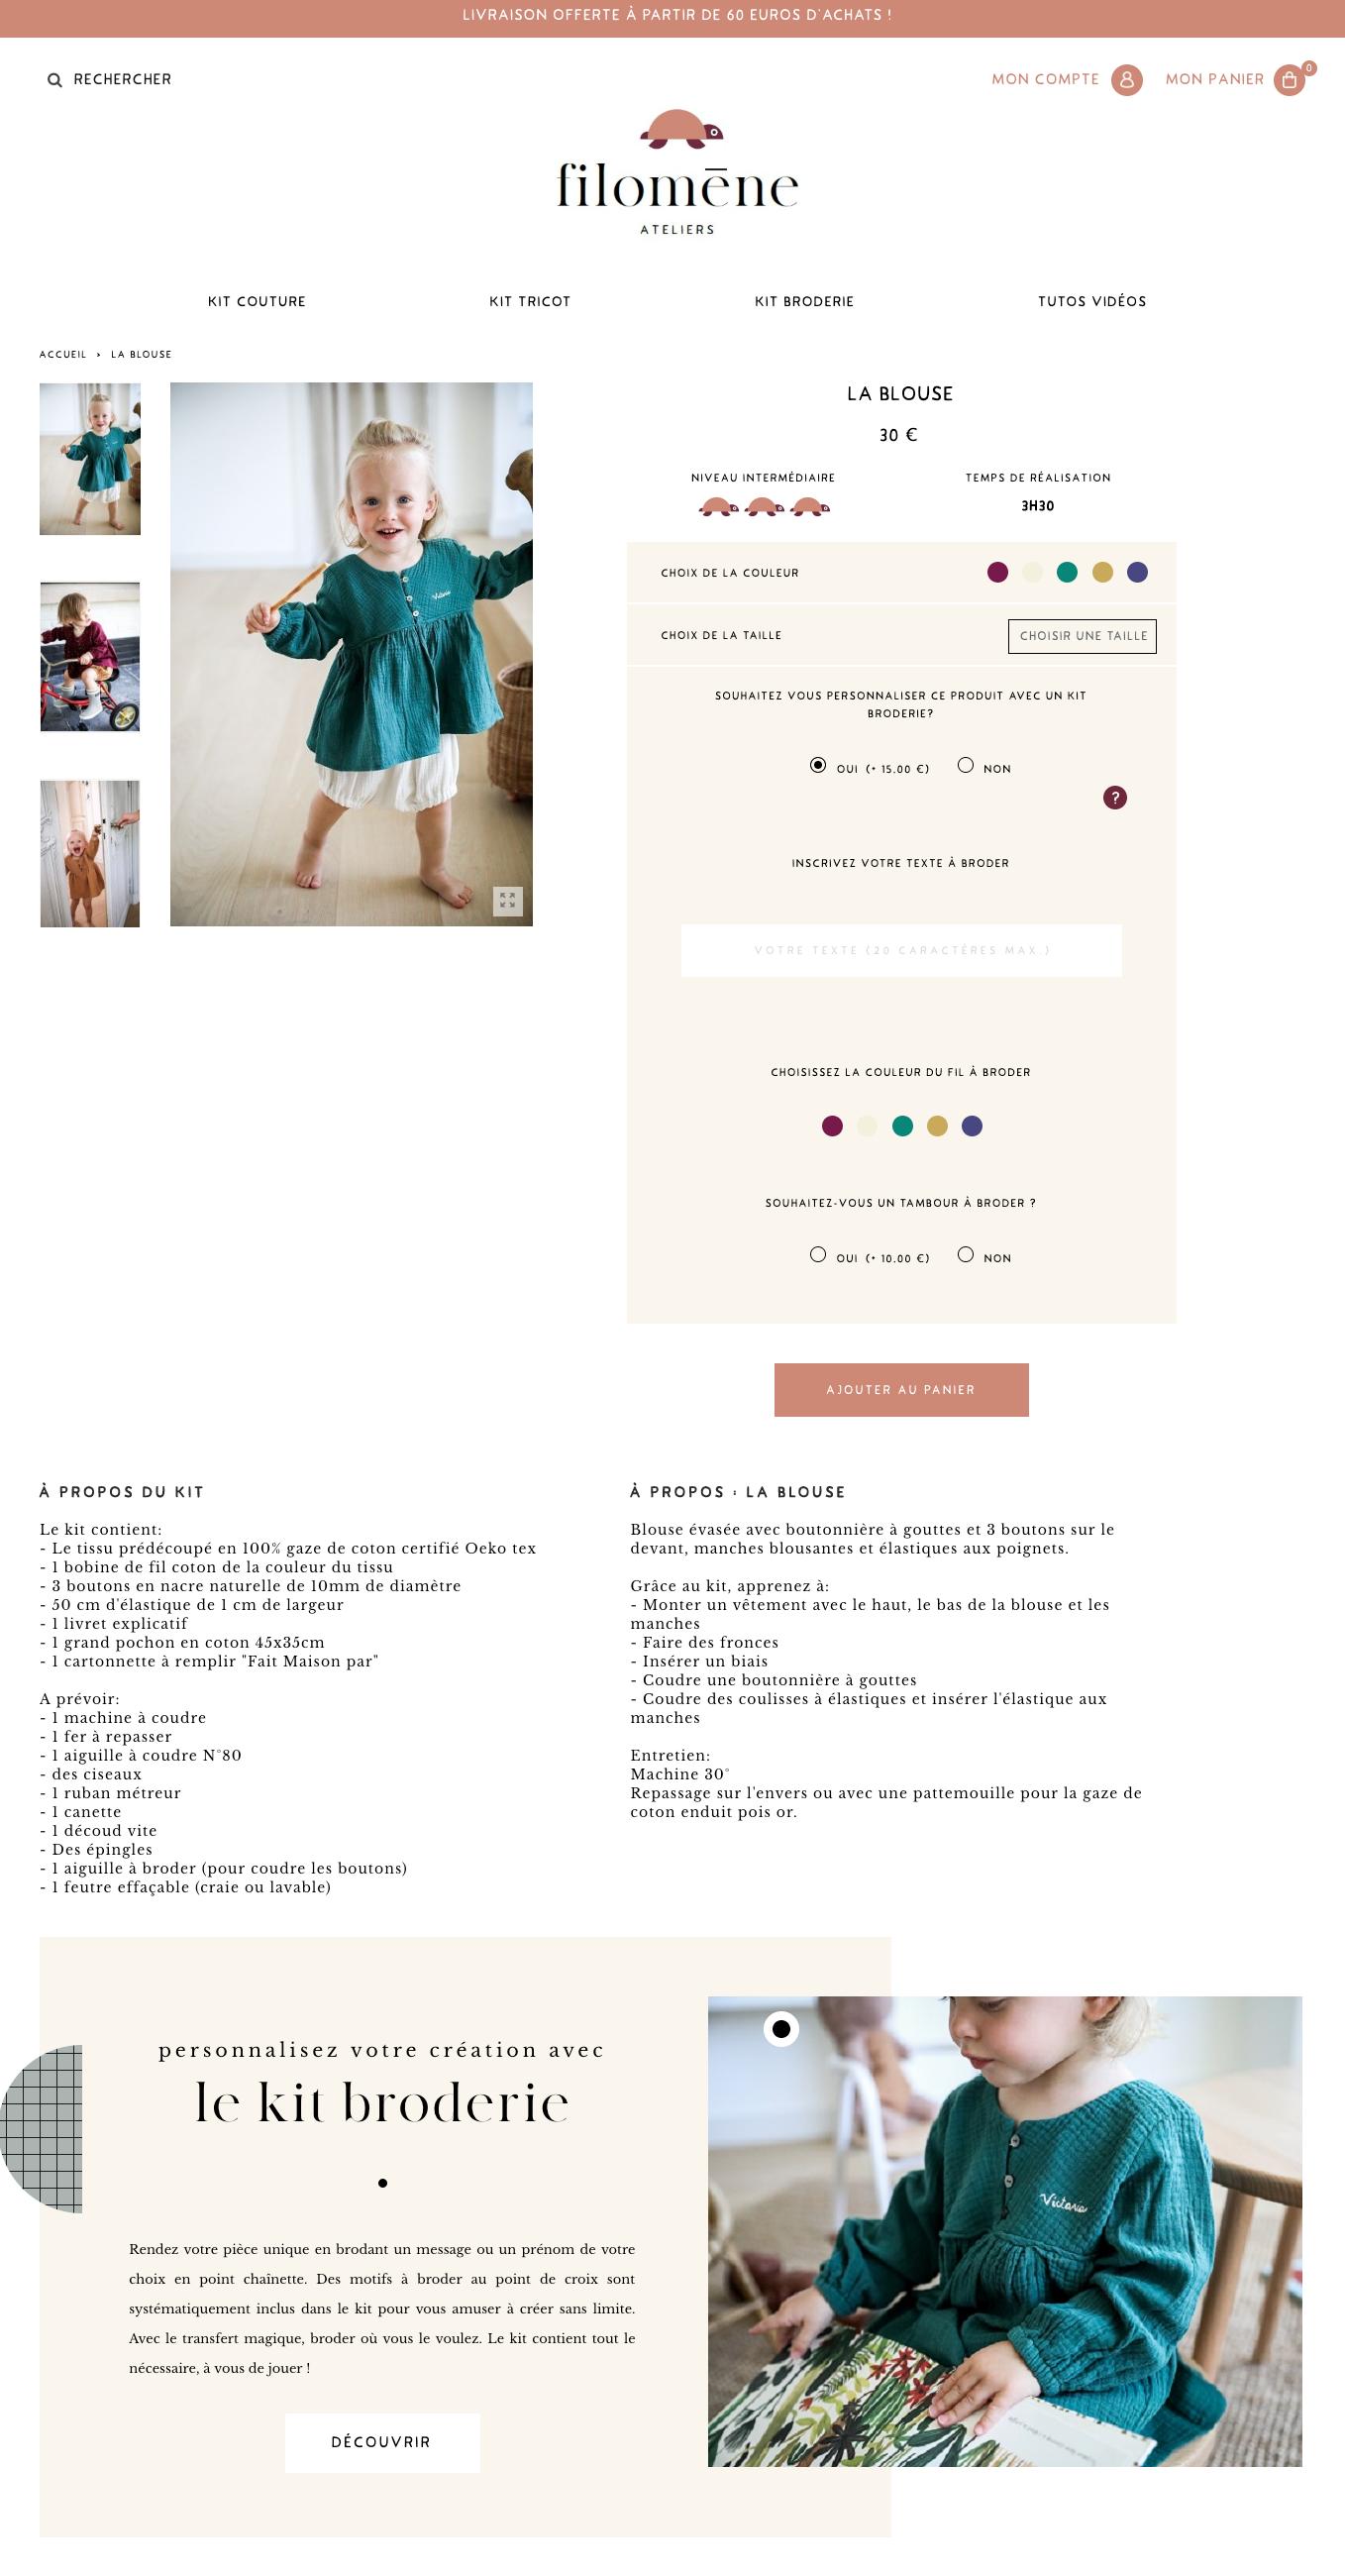 page produit filomene